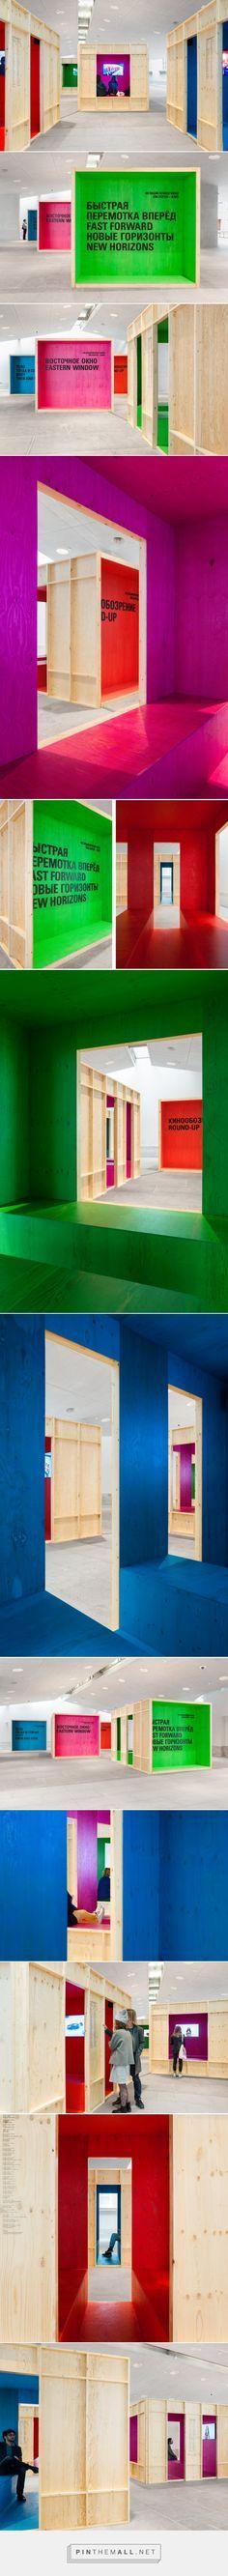 ira koers and roelof mulder form freestanding cinemas for manifesta 10 - created via http://pinthemall.net